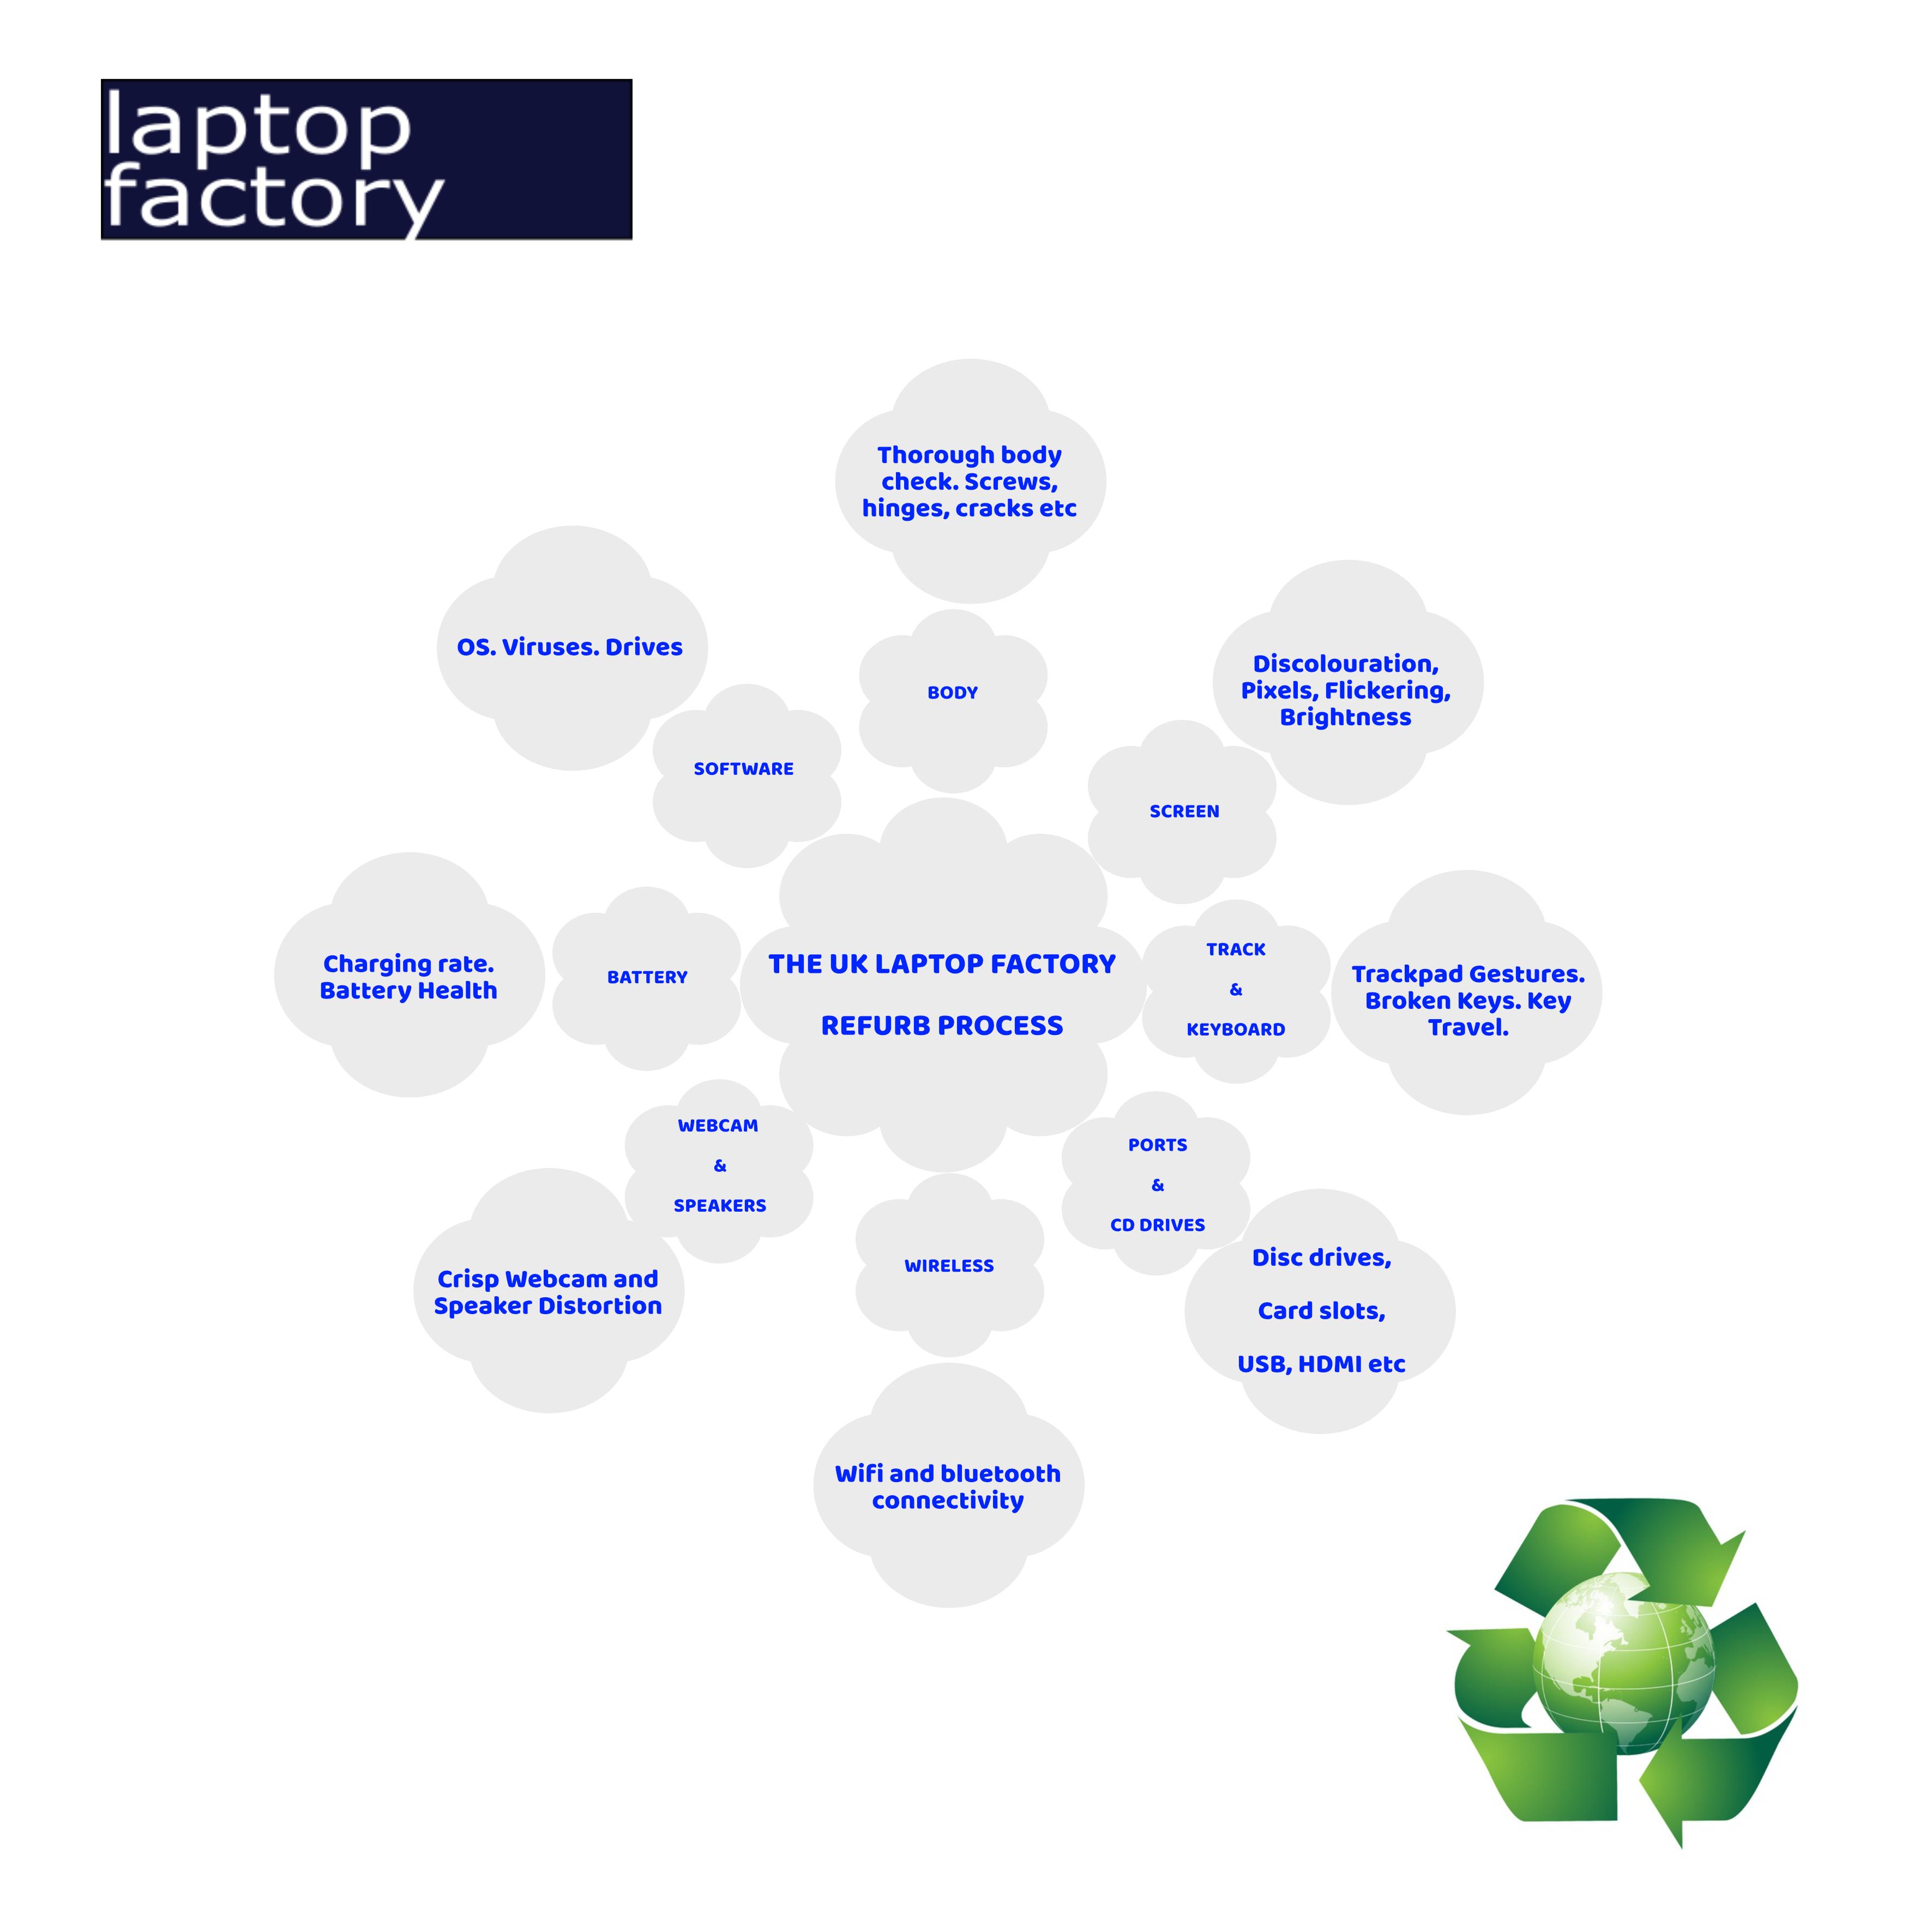 Laptop refurbishment process